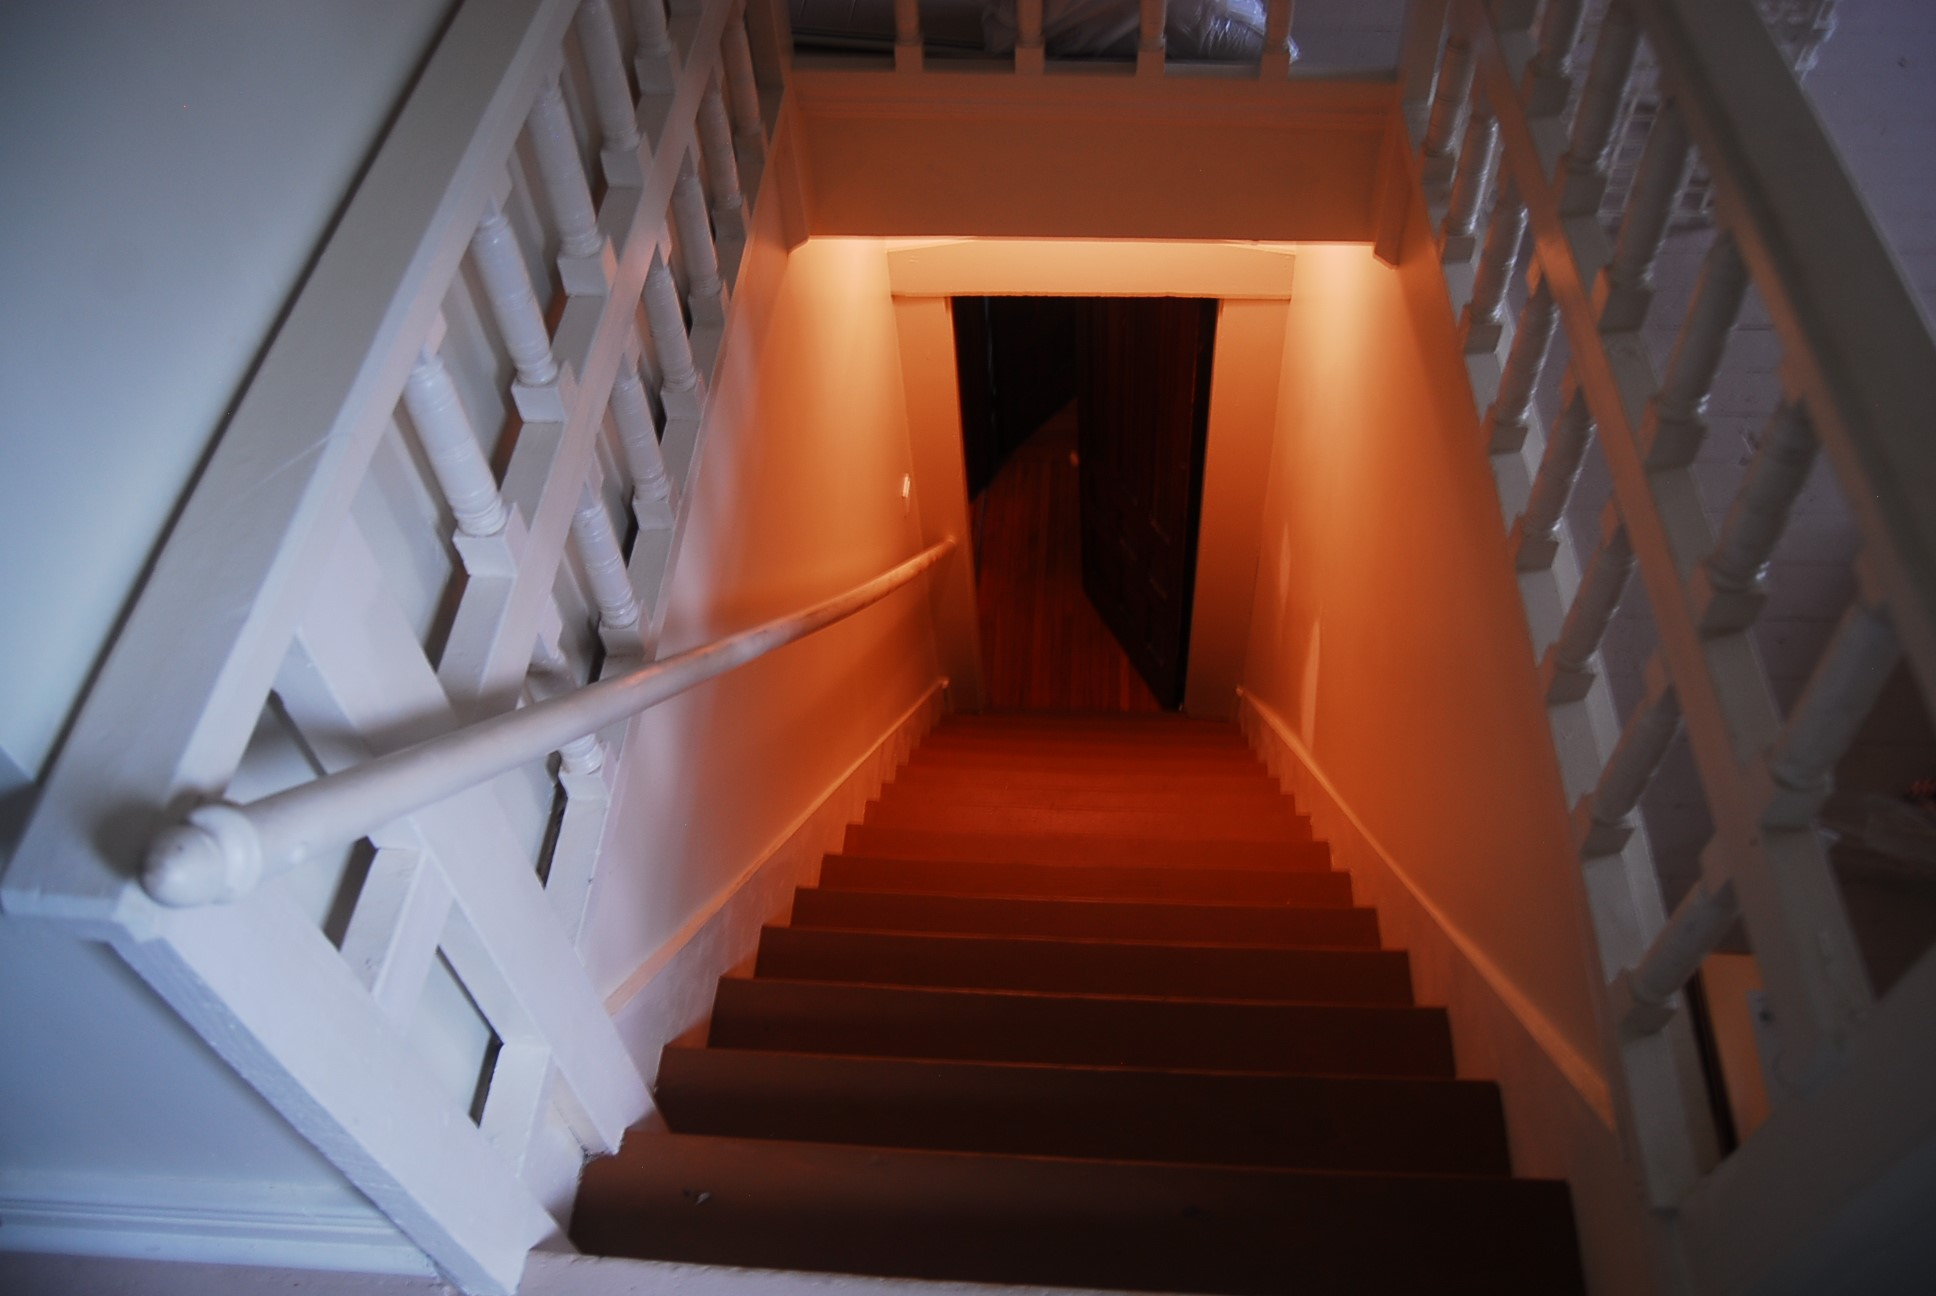 Stairway to Third Floor